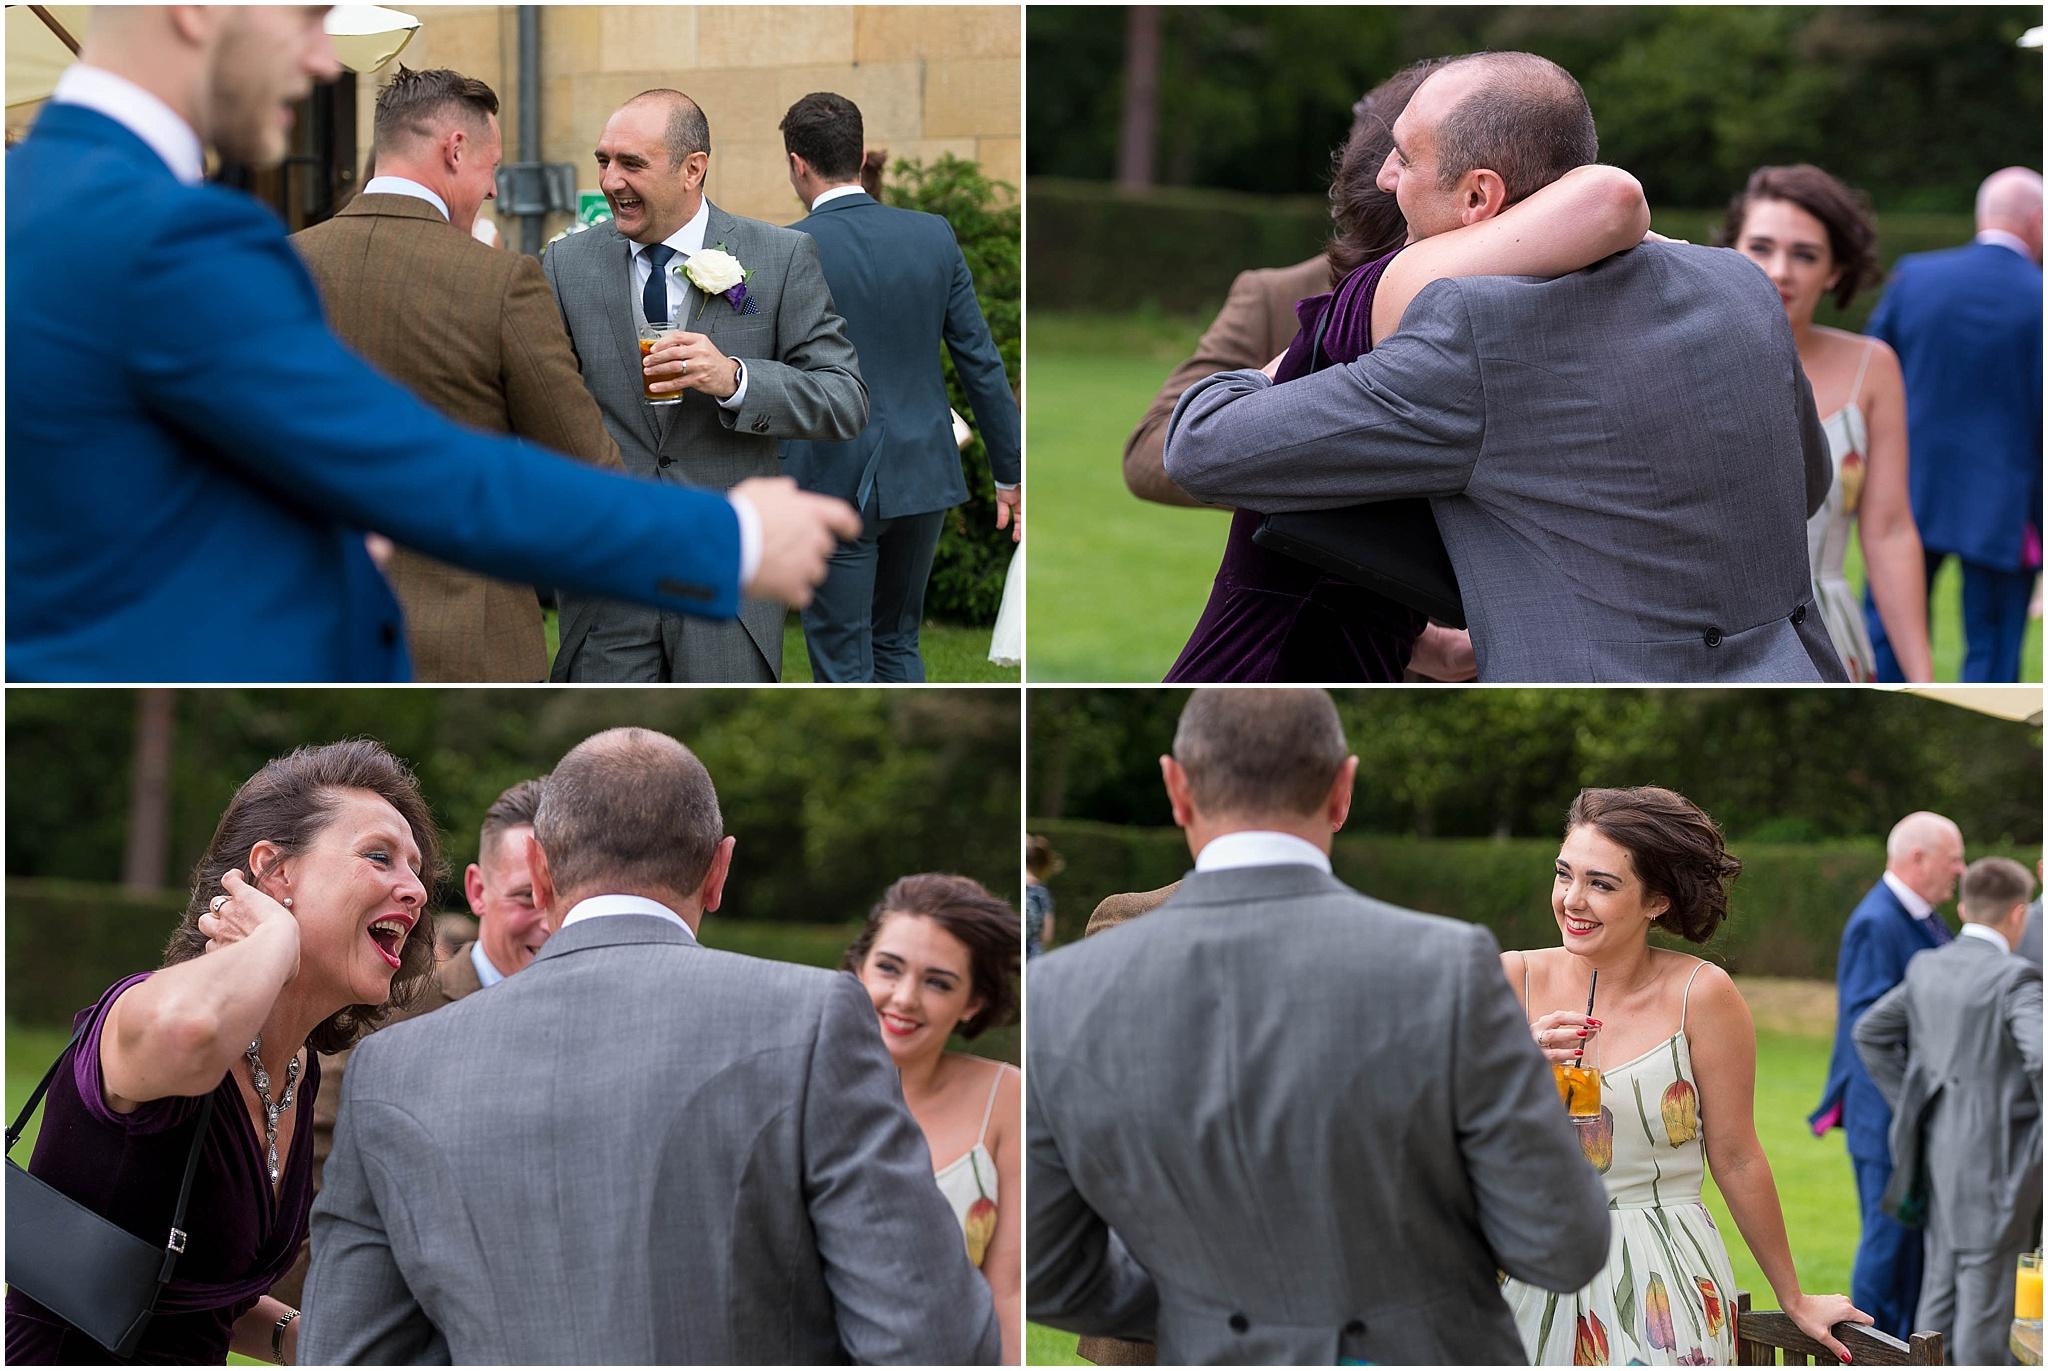 Crathorne Hall Hotel Wedding Photographer105.jpg